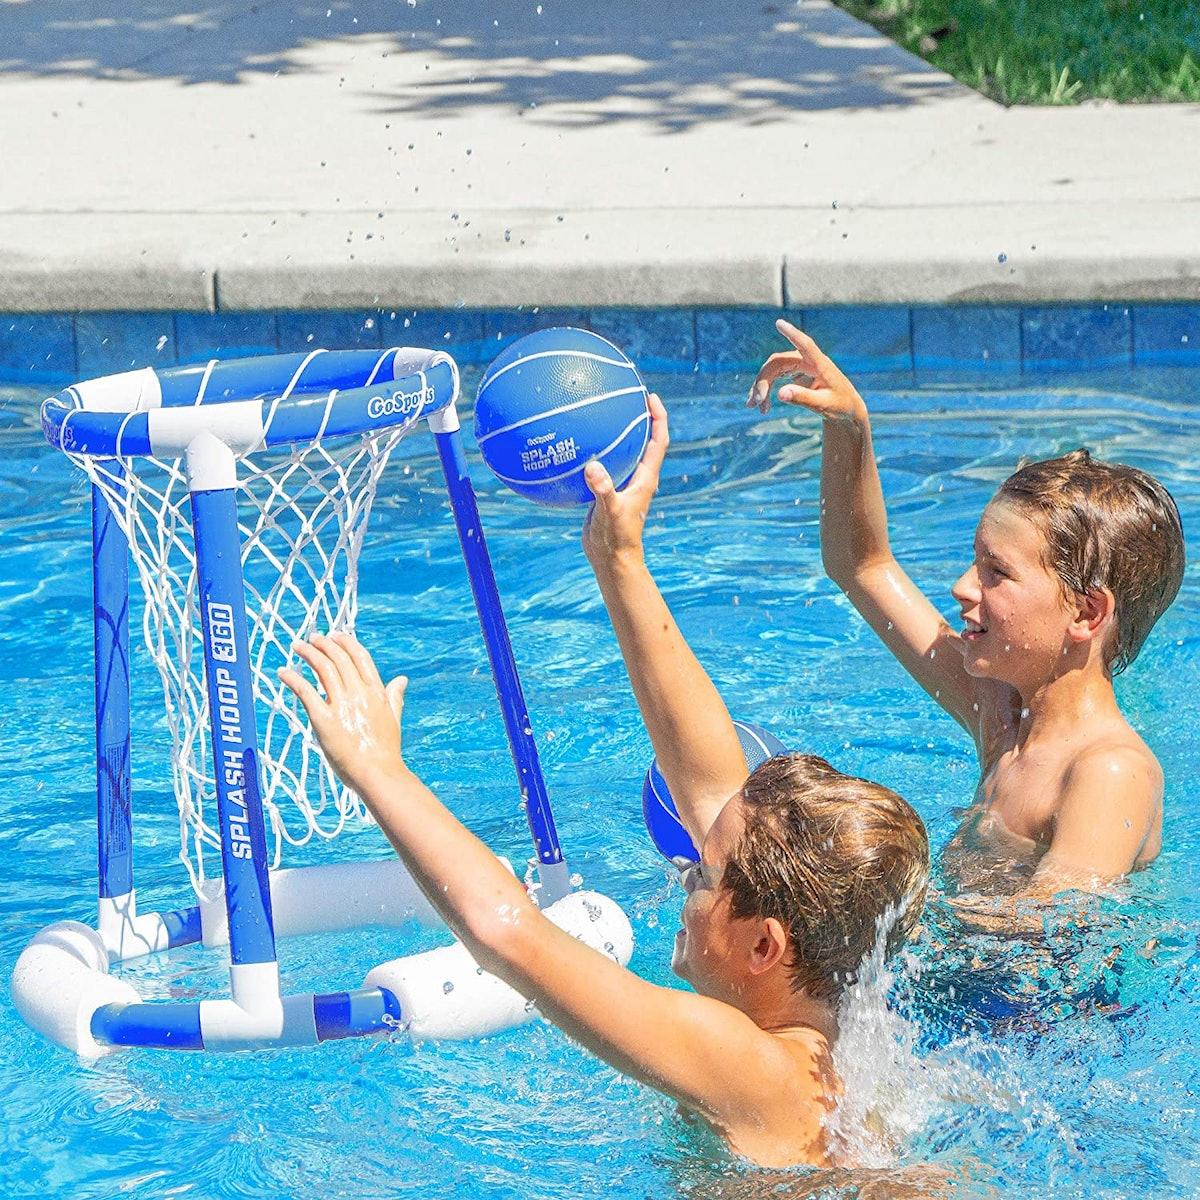 GoSports Splash Hoop 360 Floating Pool Basketball Game